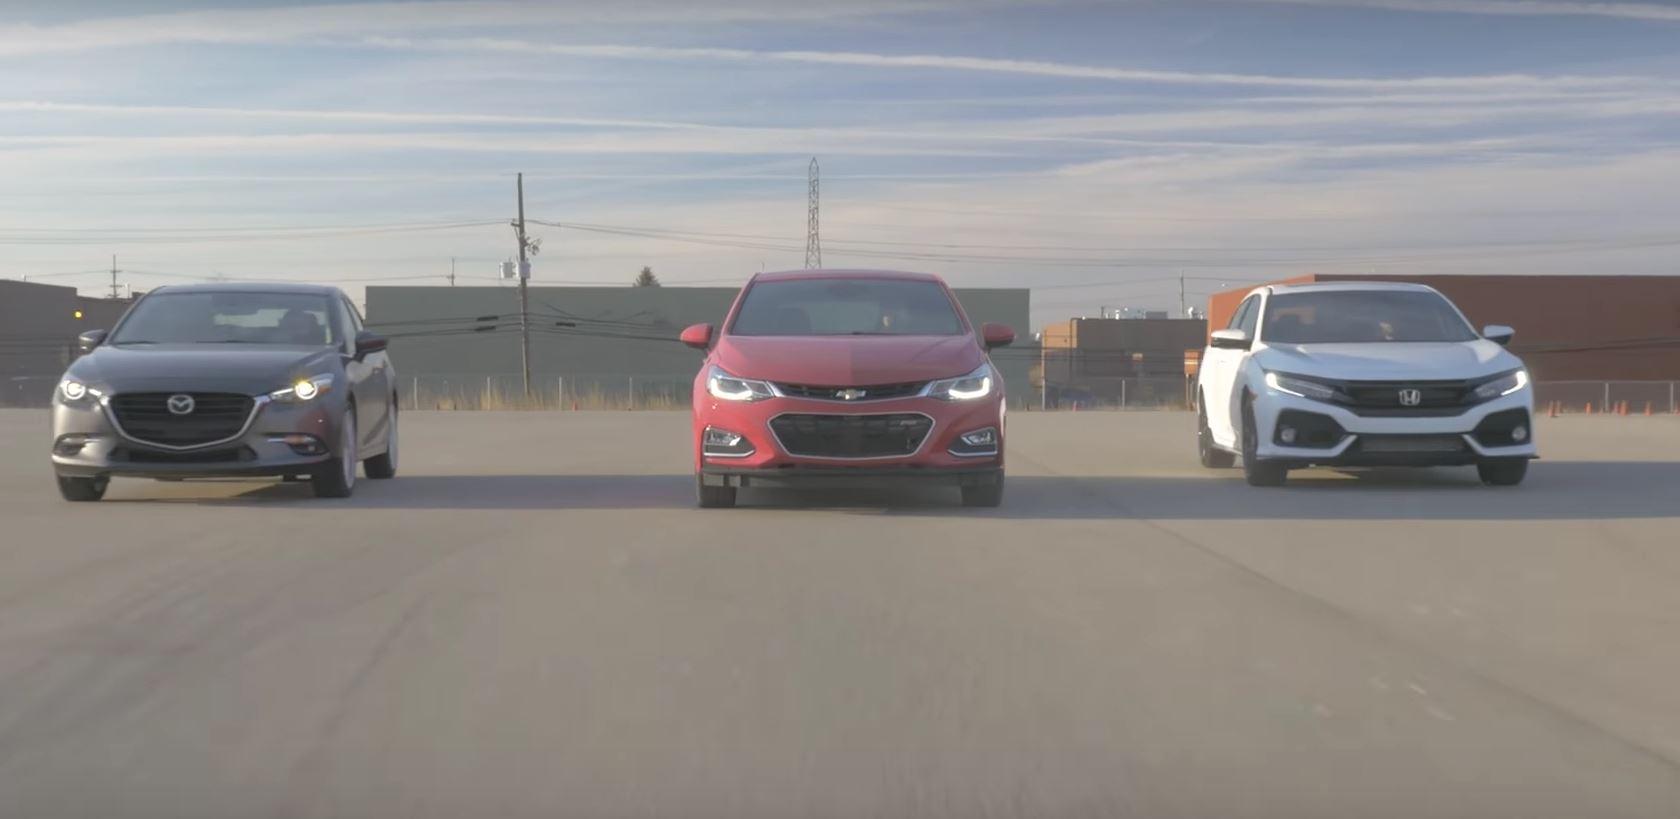 Honda Civic Hatchback Vs. Mazda3 Vs. Chevy Cruze Includes A Short Race